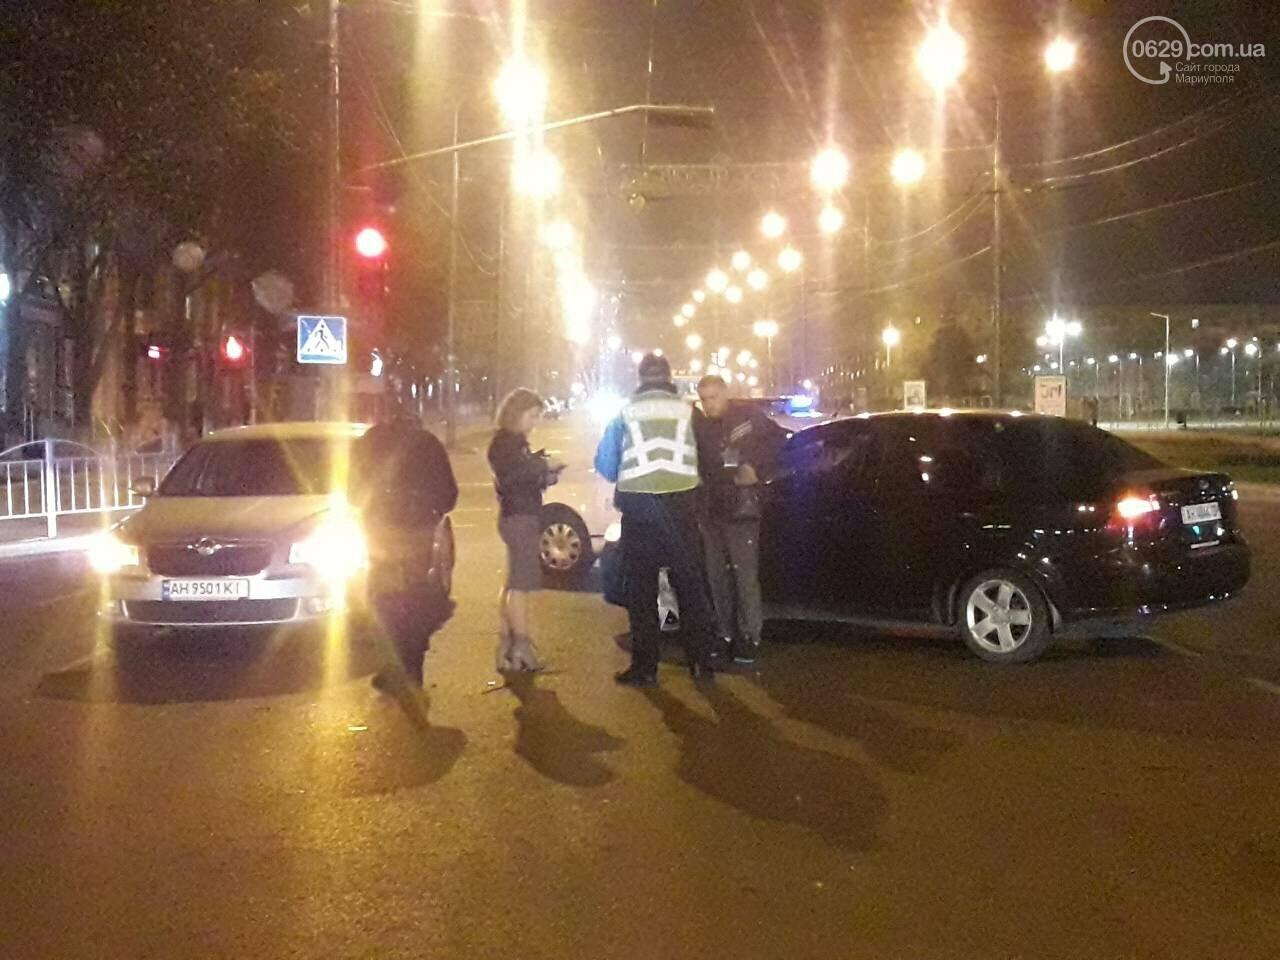 В центре Мариуполя столкнулись два автомобиля, — ФОТО, фото-3